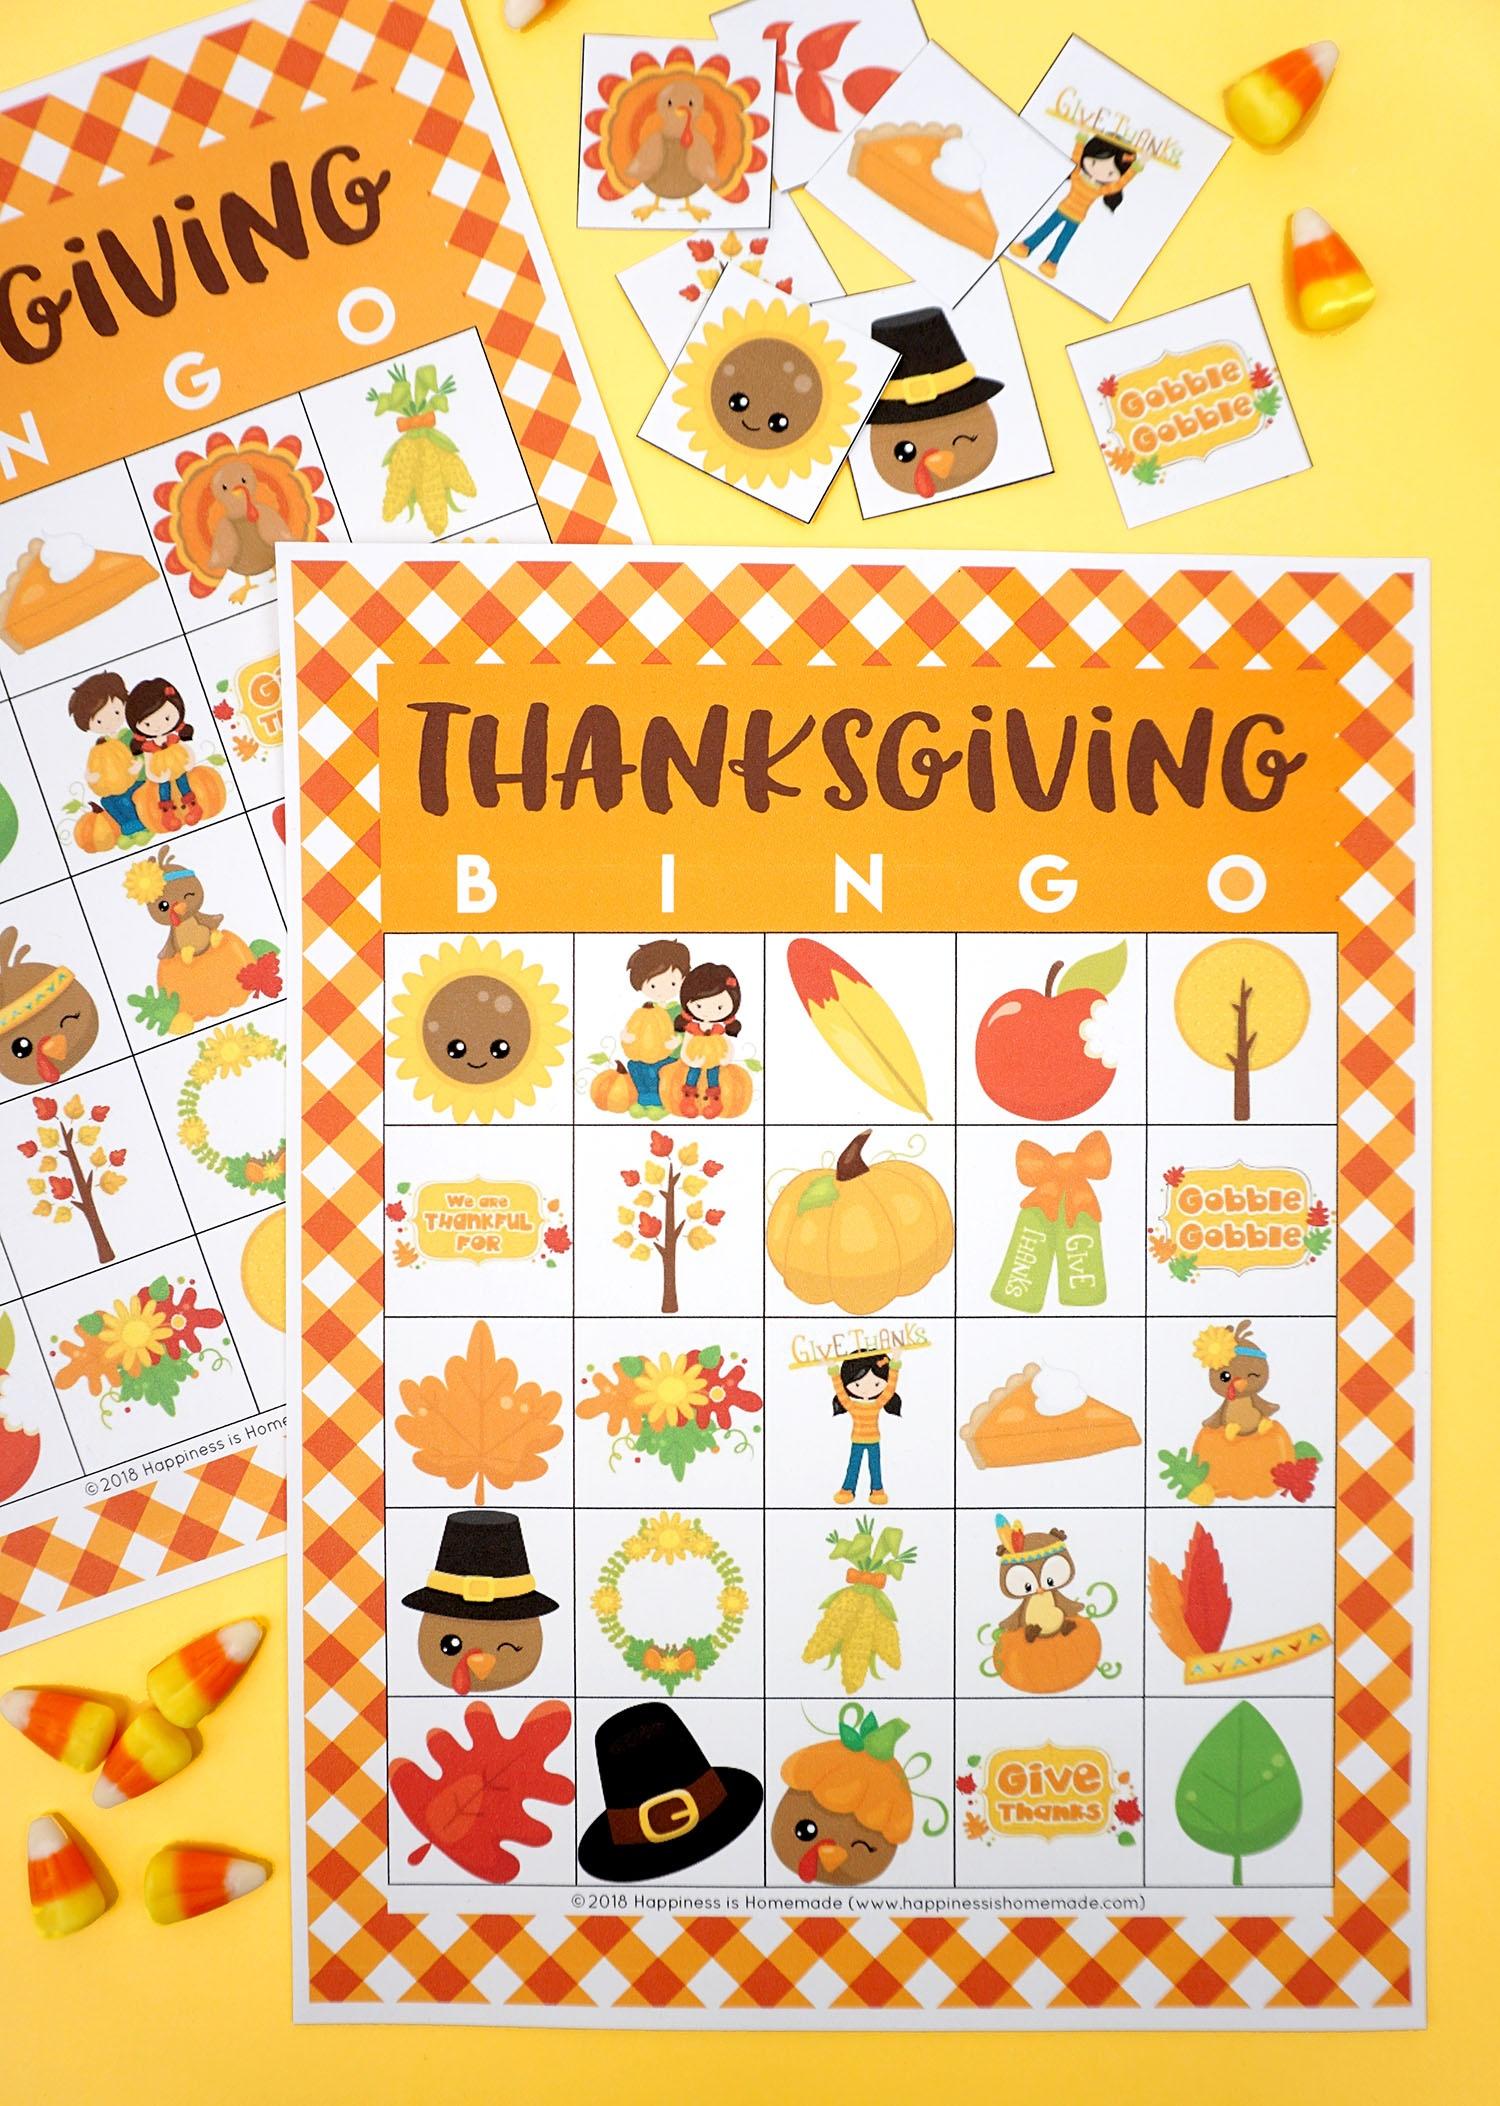 Free Printable Thanksgiving Bingo Cards - Happiness Is Homemade - Free Printable Thanksgiving Cards